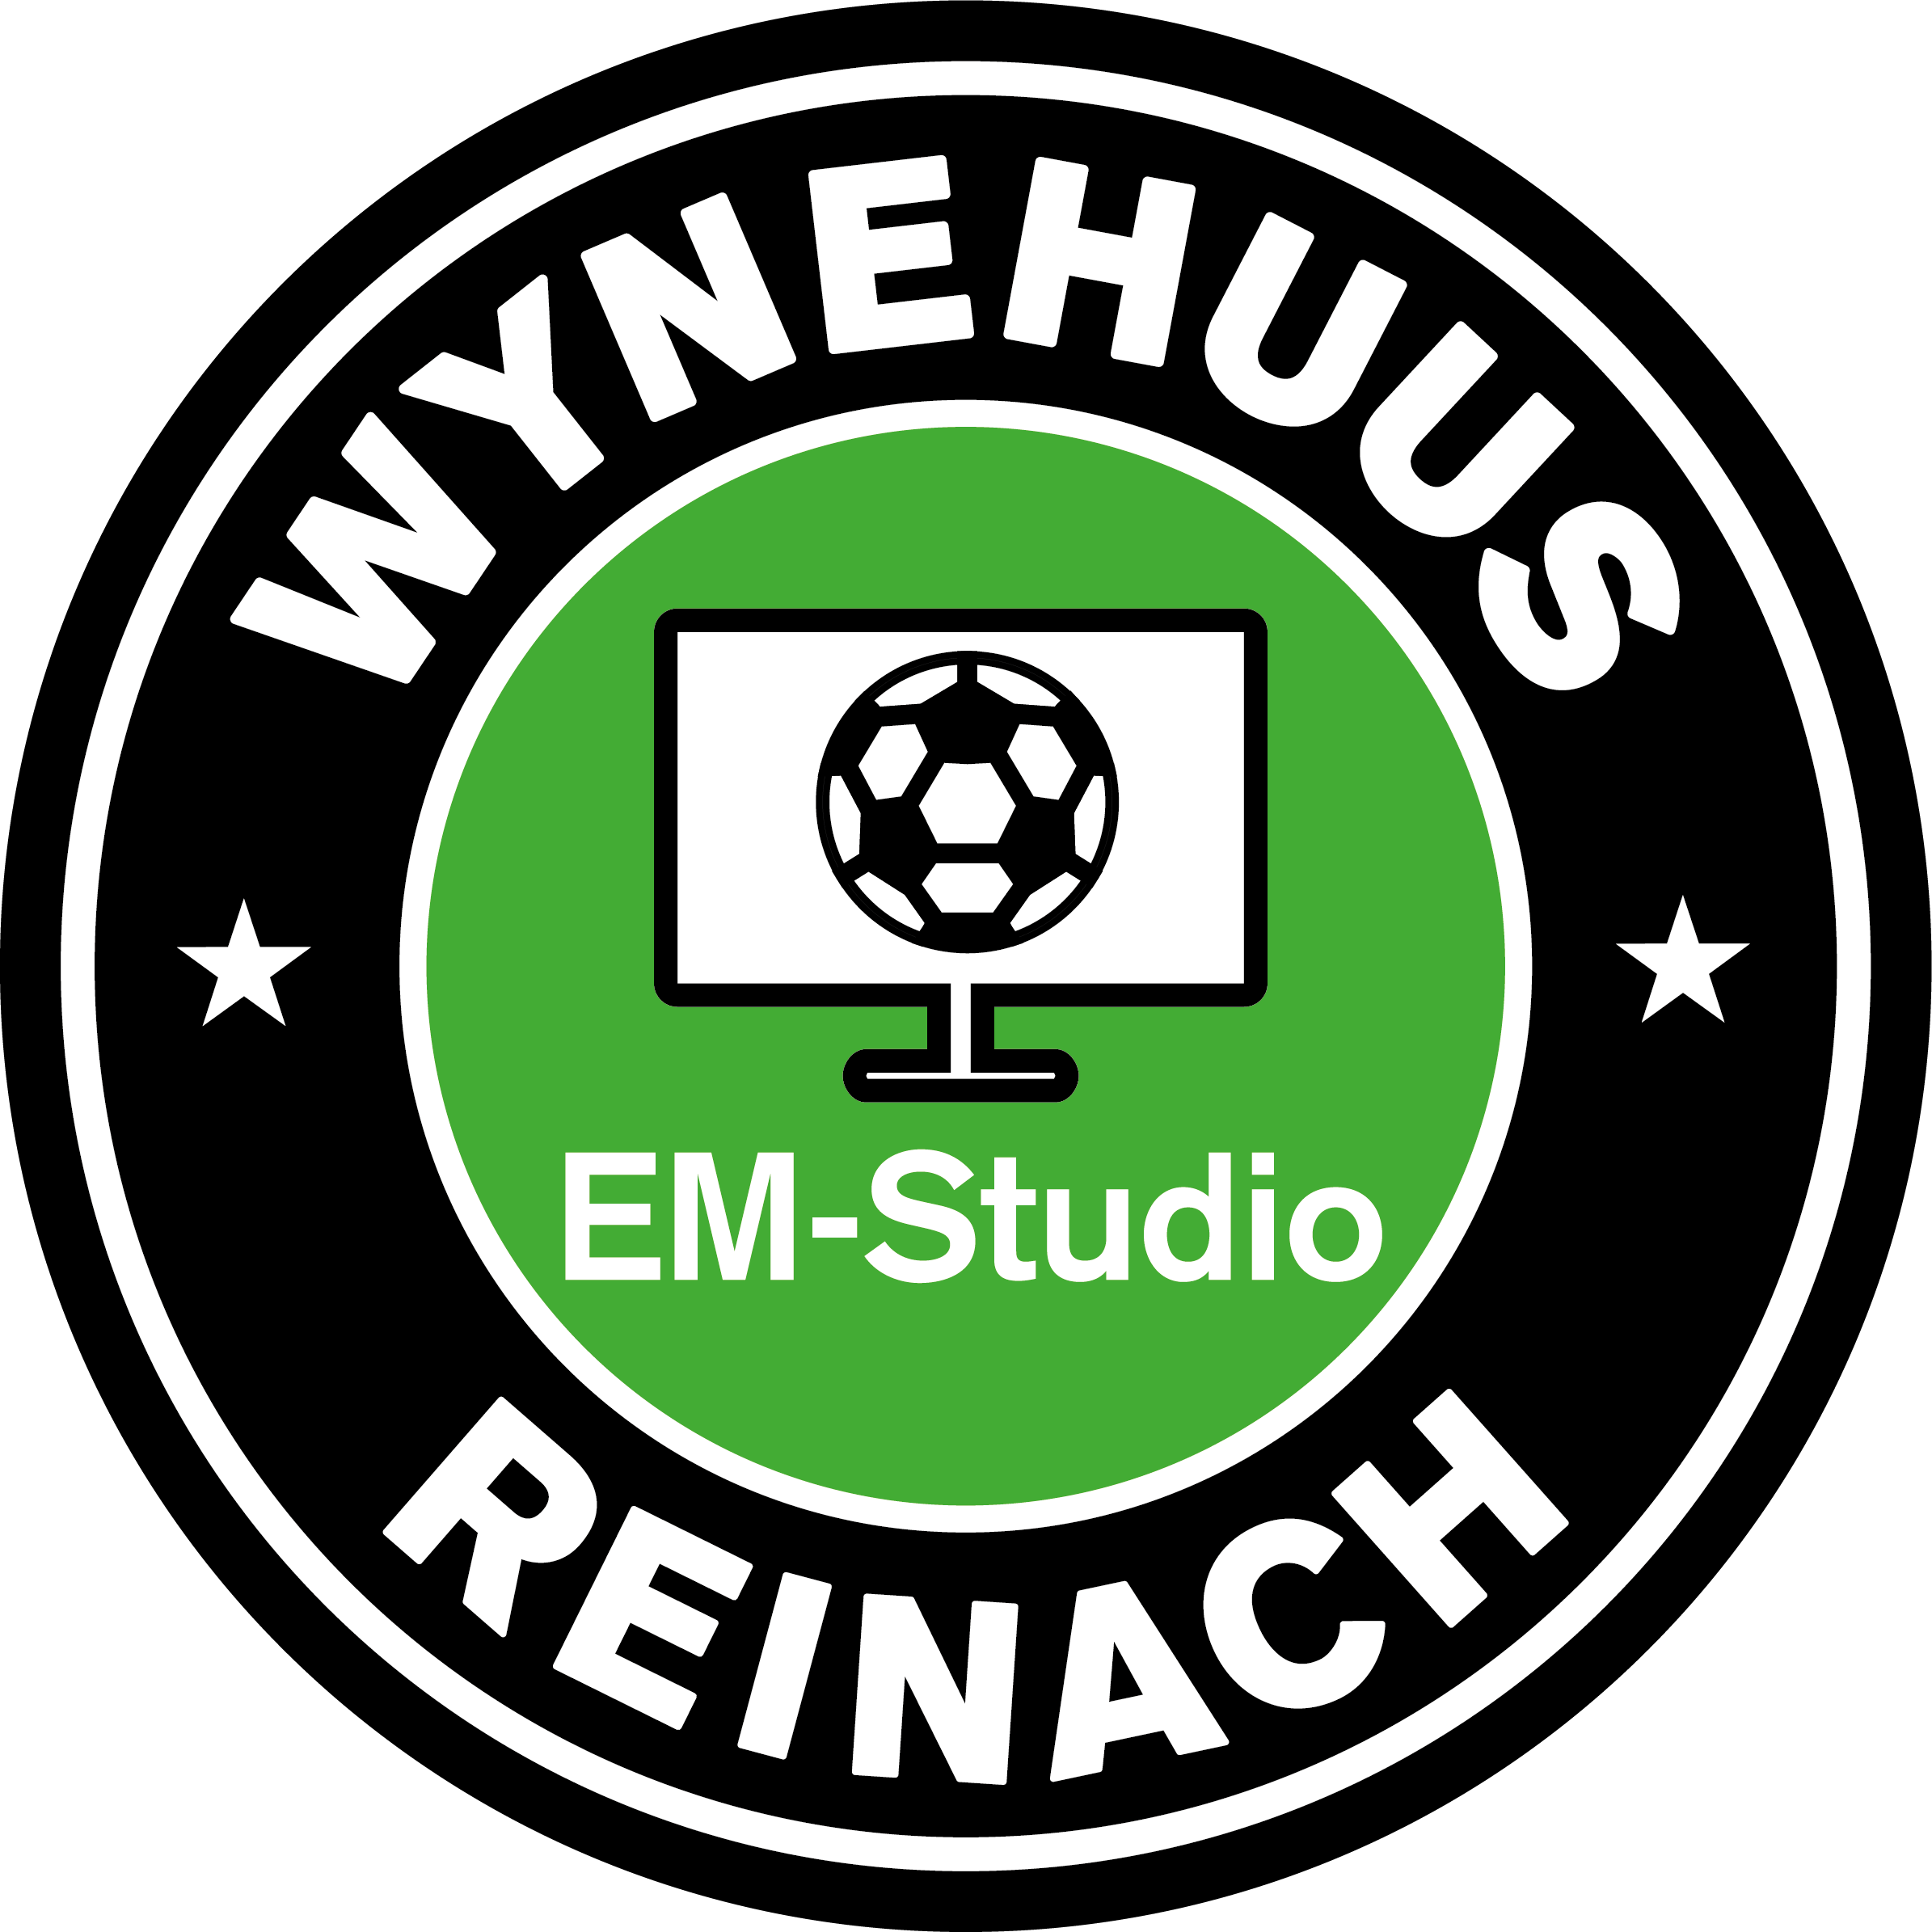 Wynehuus_fussball